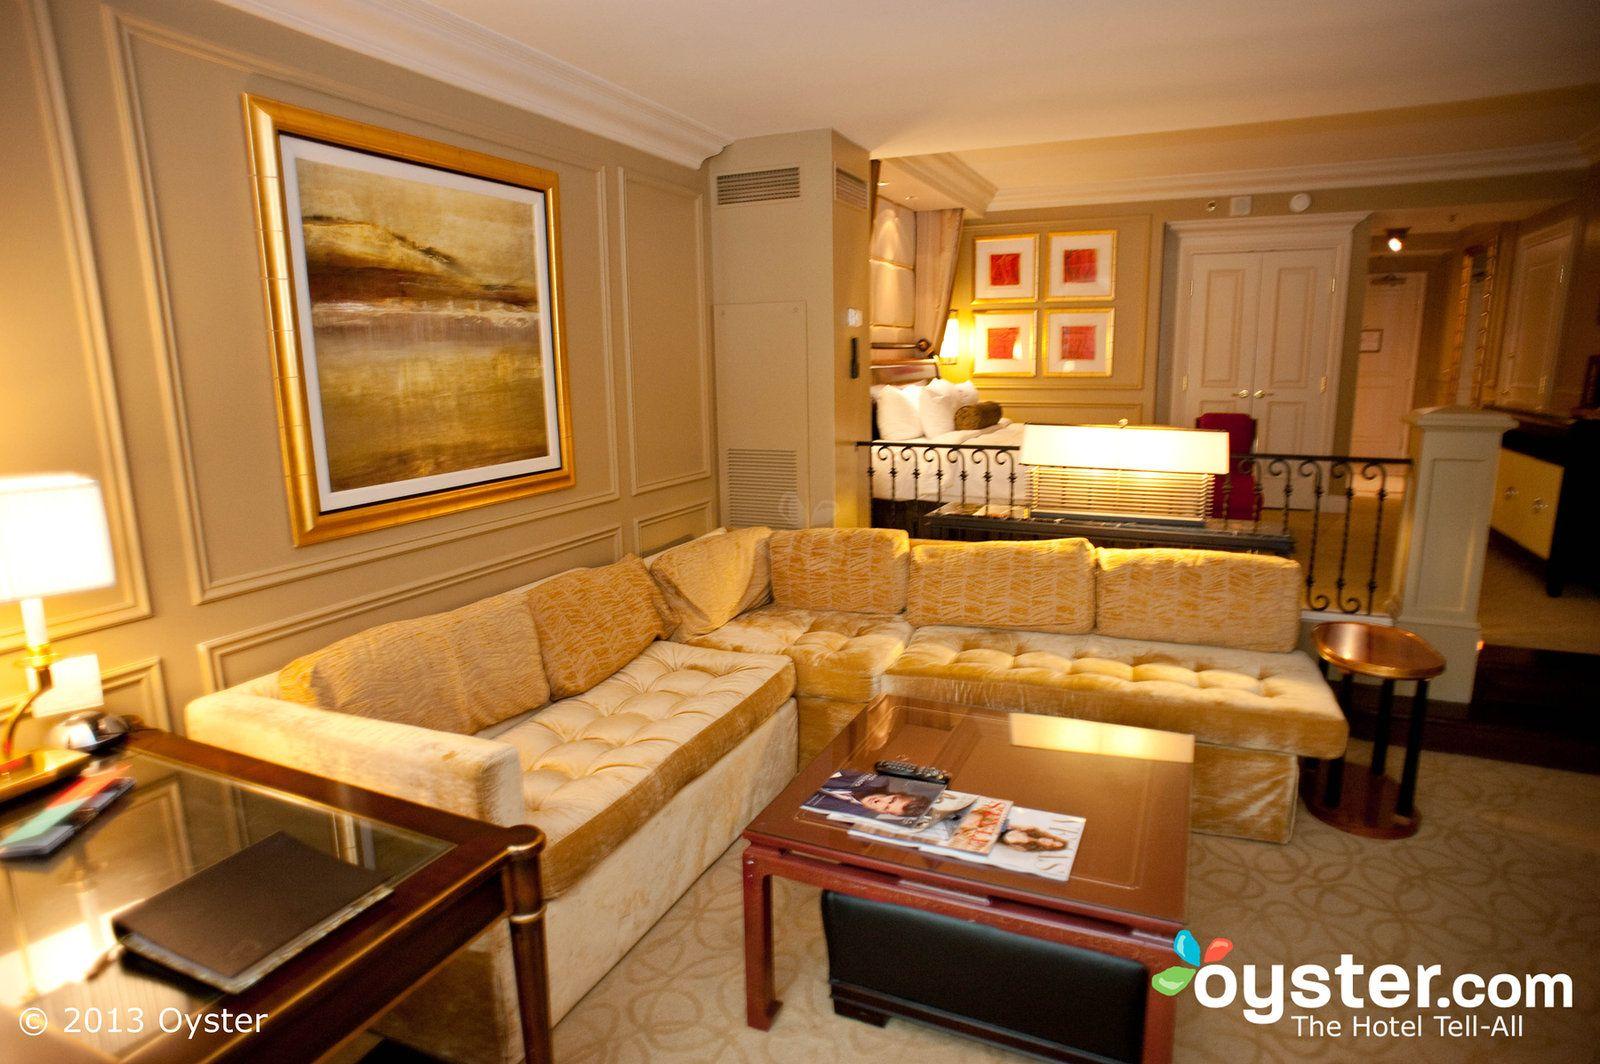 The venetian las vegas hotel deals - Luxury Hotel Suites Luxury Suite At The Venetian Resort Hotel Casino Oyster Com